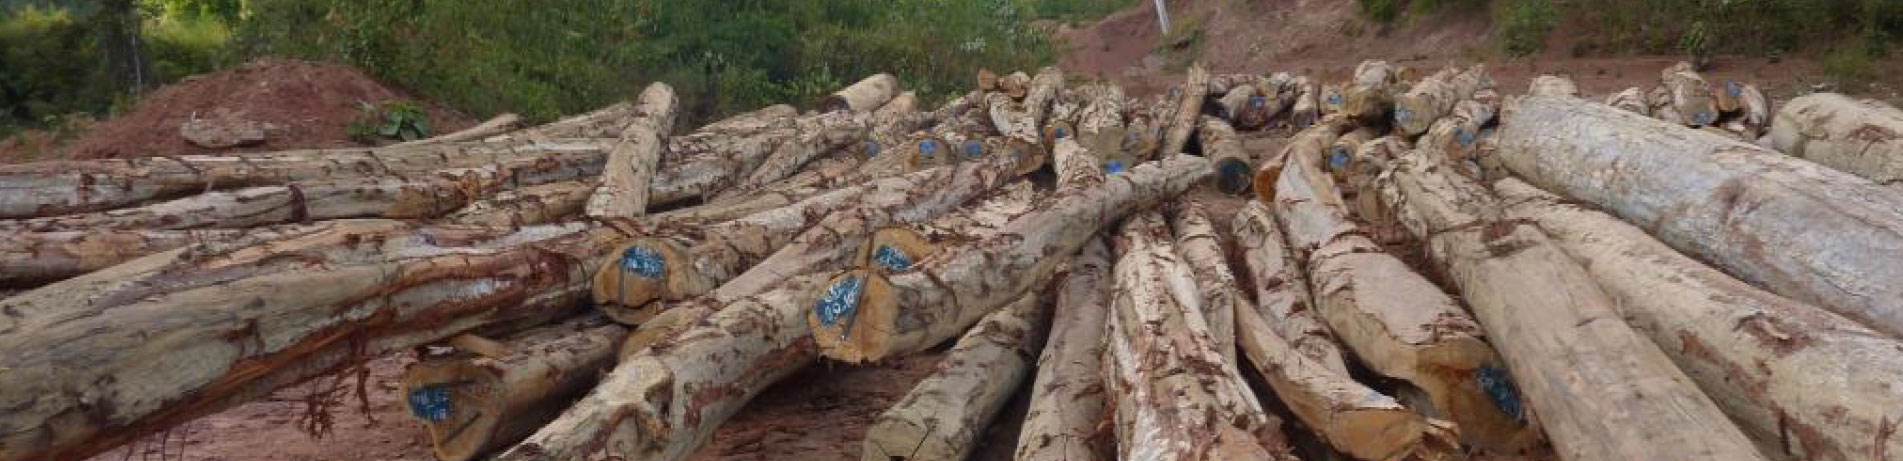 Felled Lagerstroemia logs in Laos